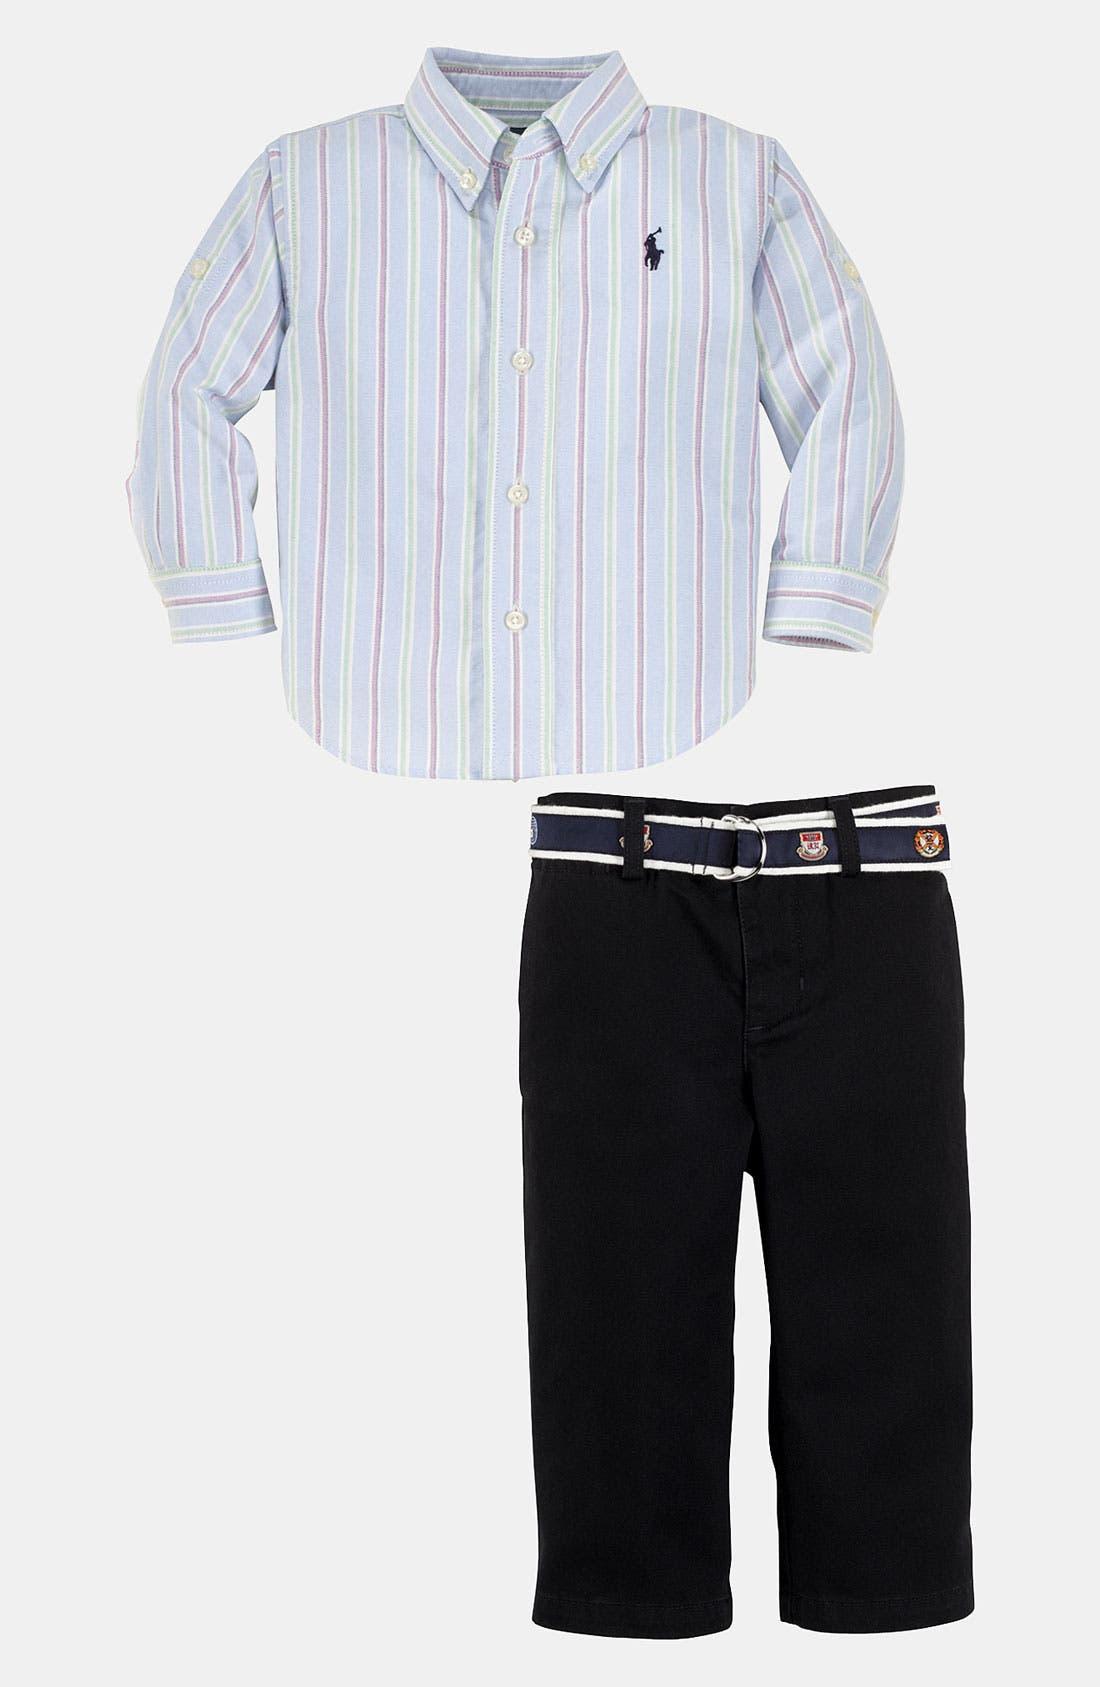 Alternate Image 2  - Ralph Lauren Stripe Shirt & Pants (Infant)